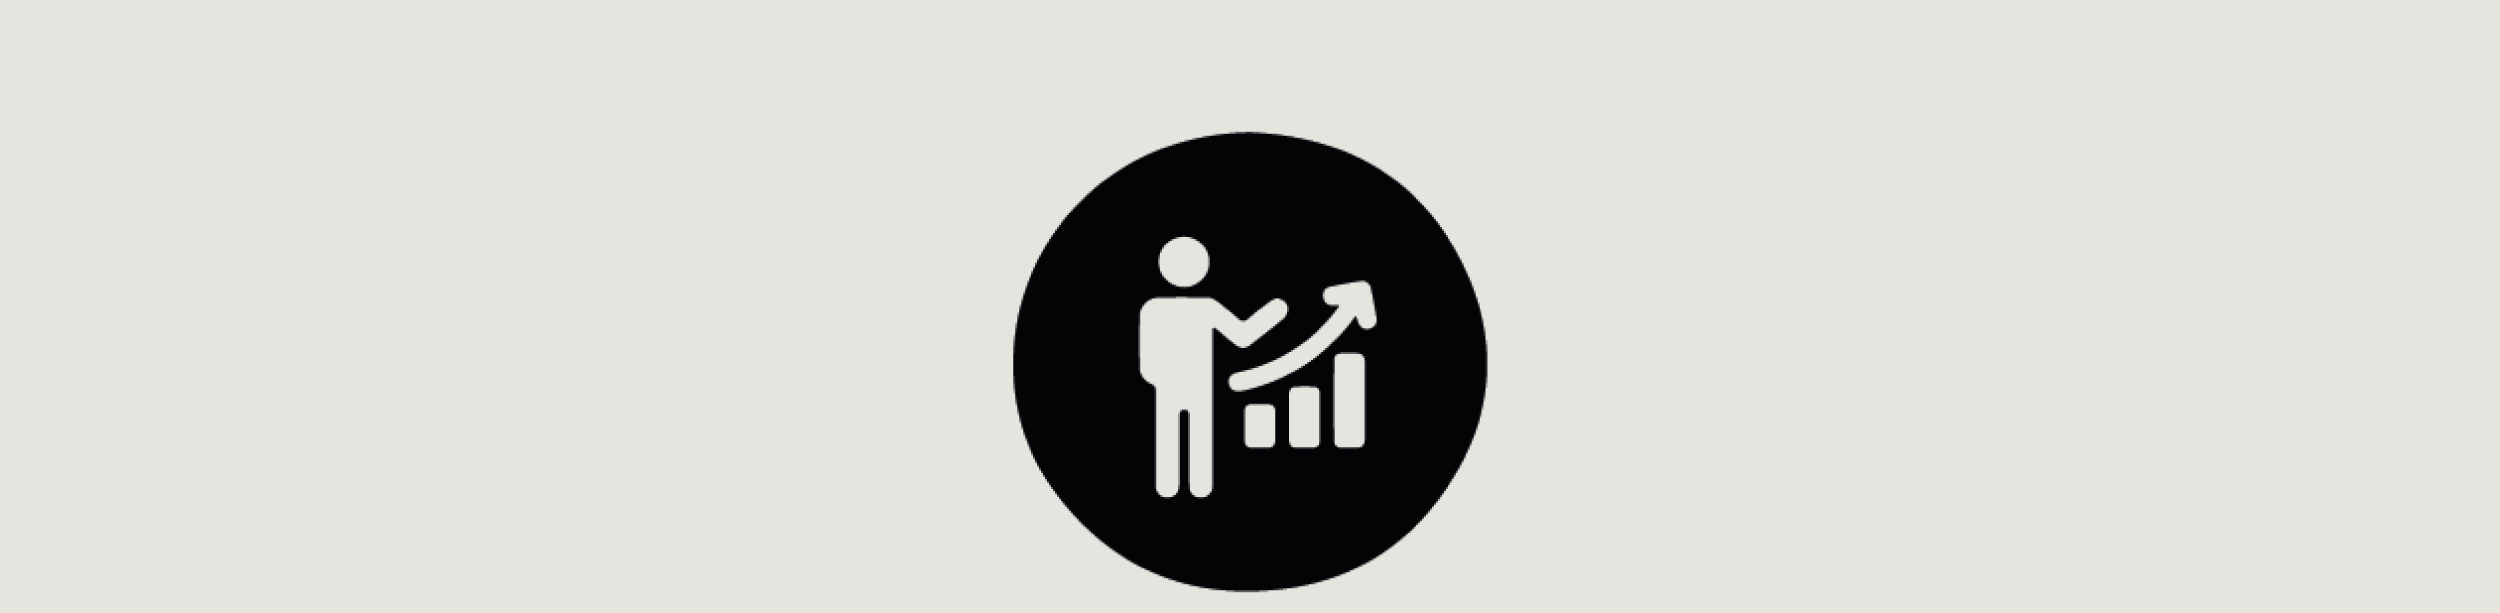 ADVISORY CORPORATE GOVERNANCE - Unleash the Corporate Governance value potential